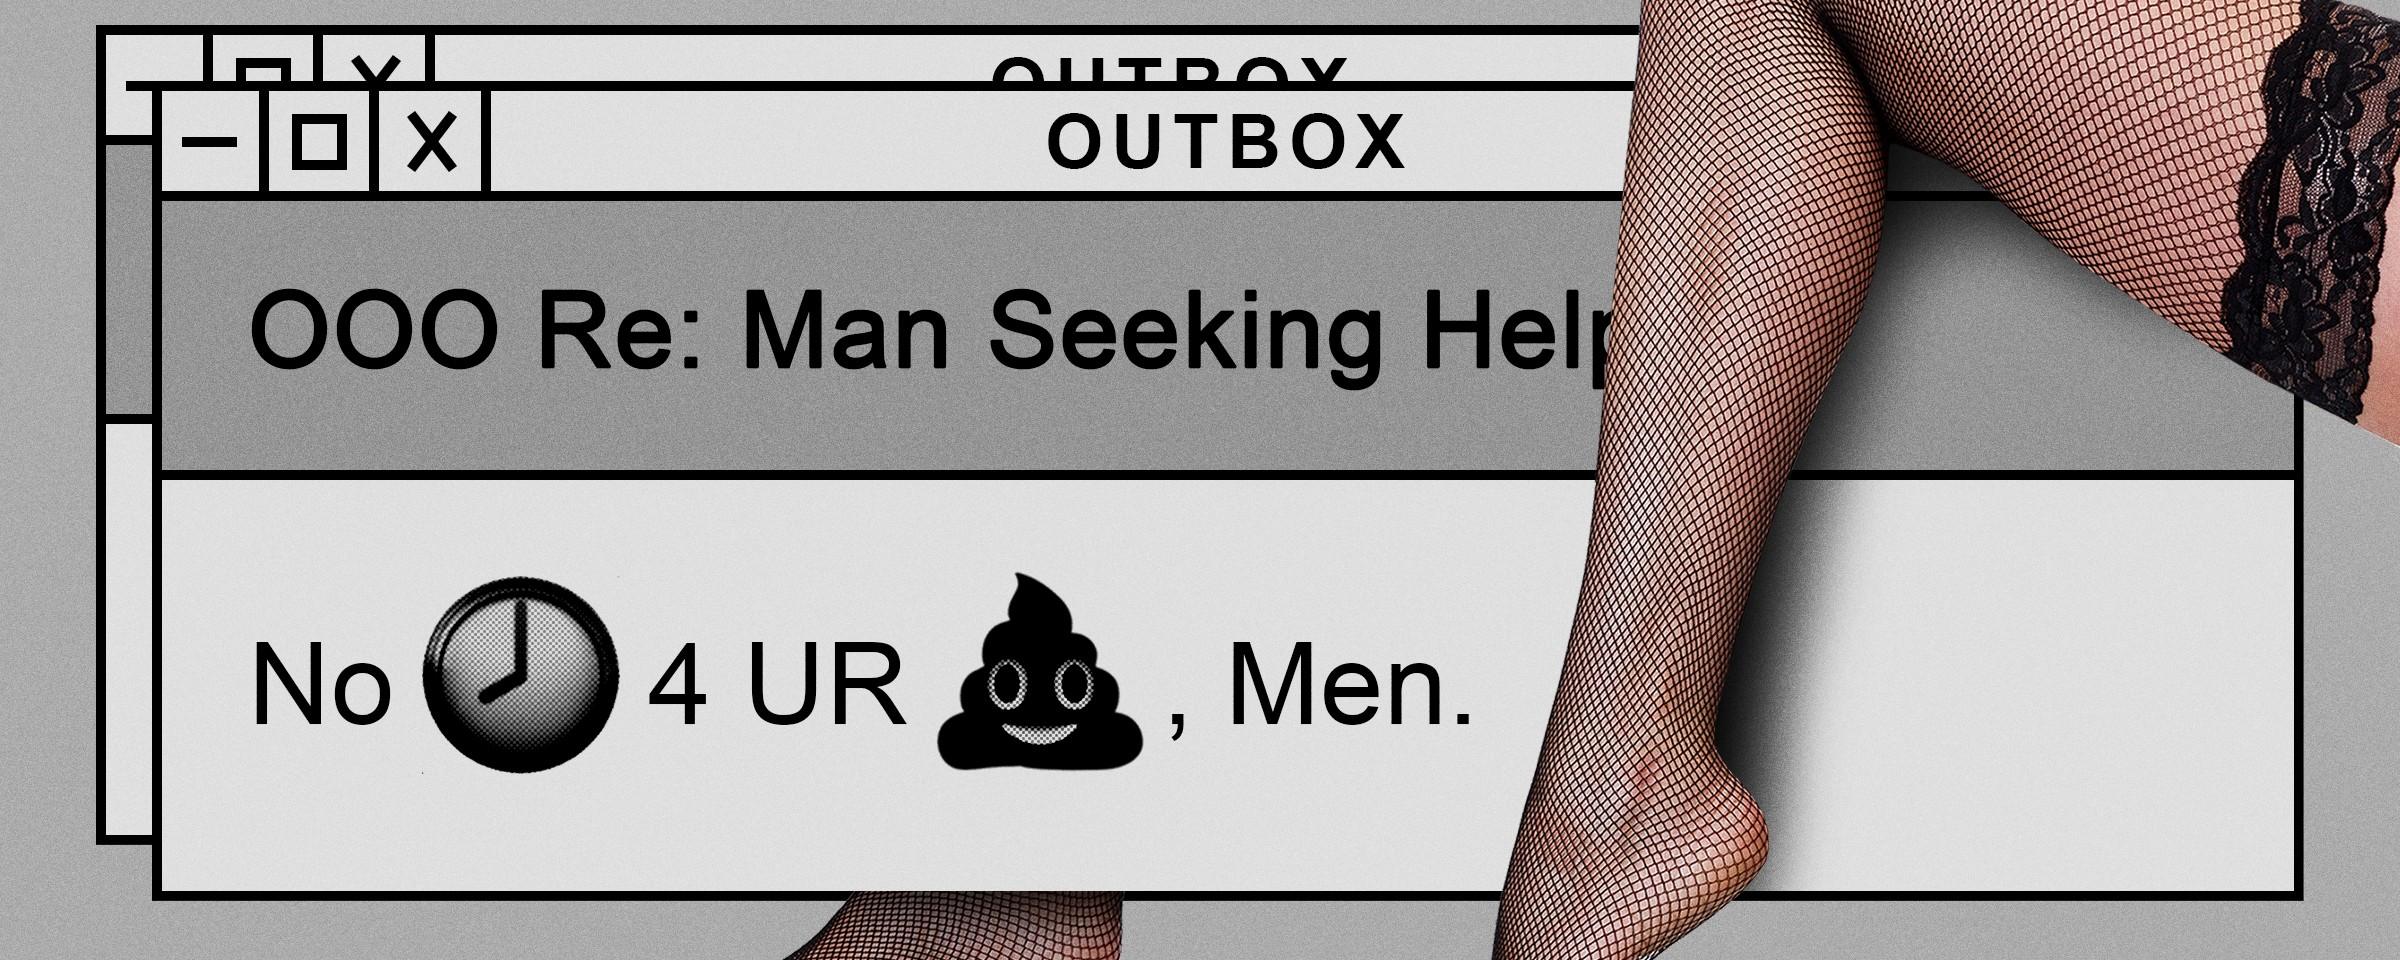 Grinder gay de dating site- ul